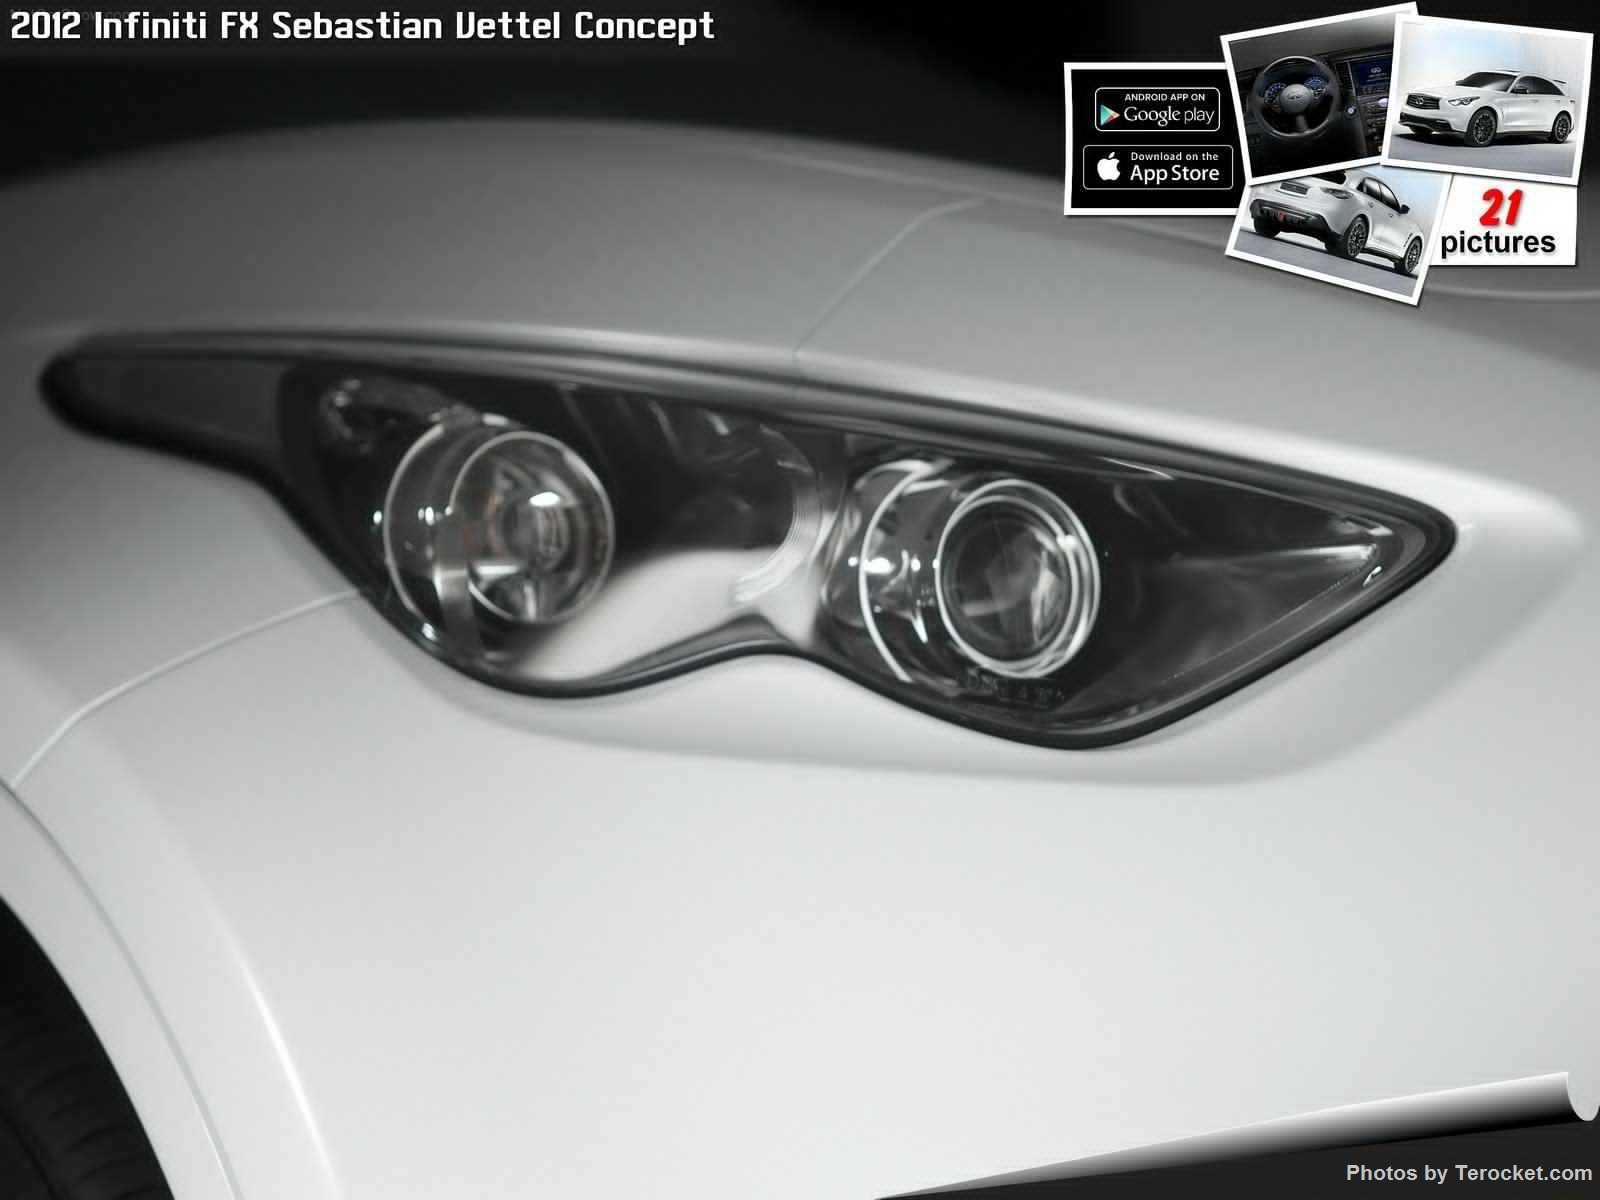 Hình ảnh xe ô tô Infiniti FX Sebastian Vettel Concept 2012 & nội ngoại thất